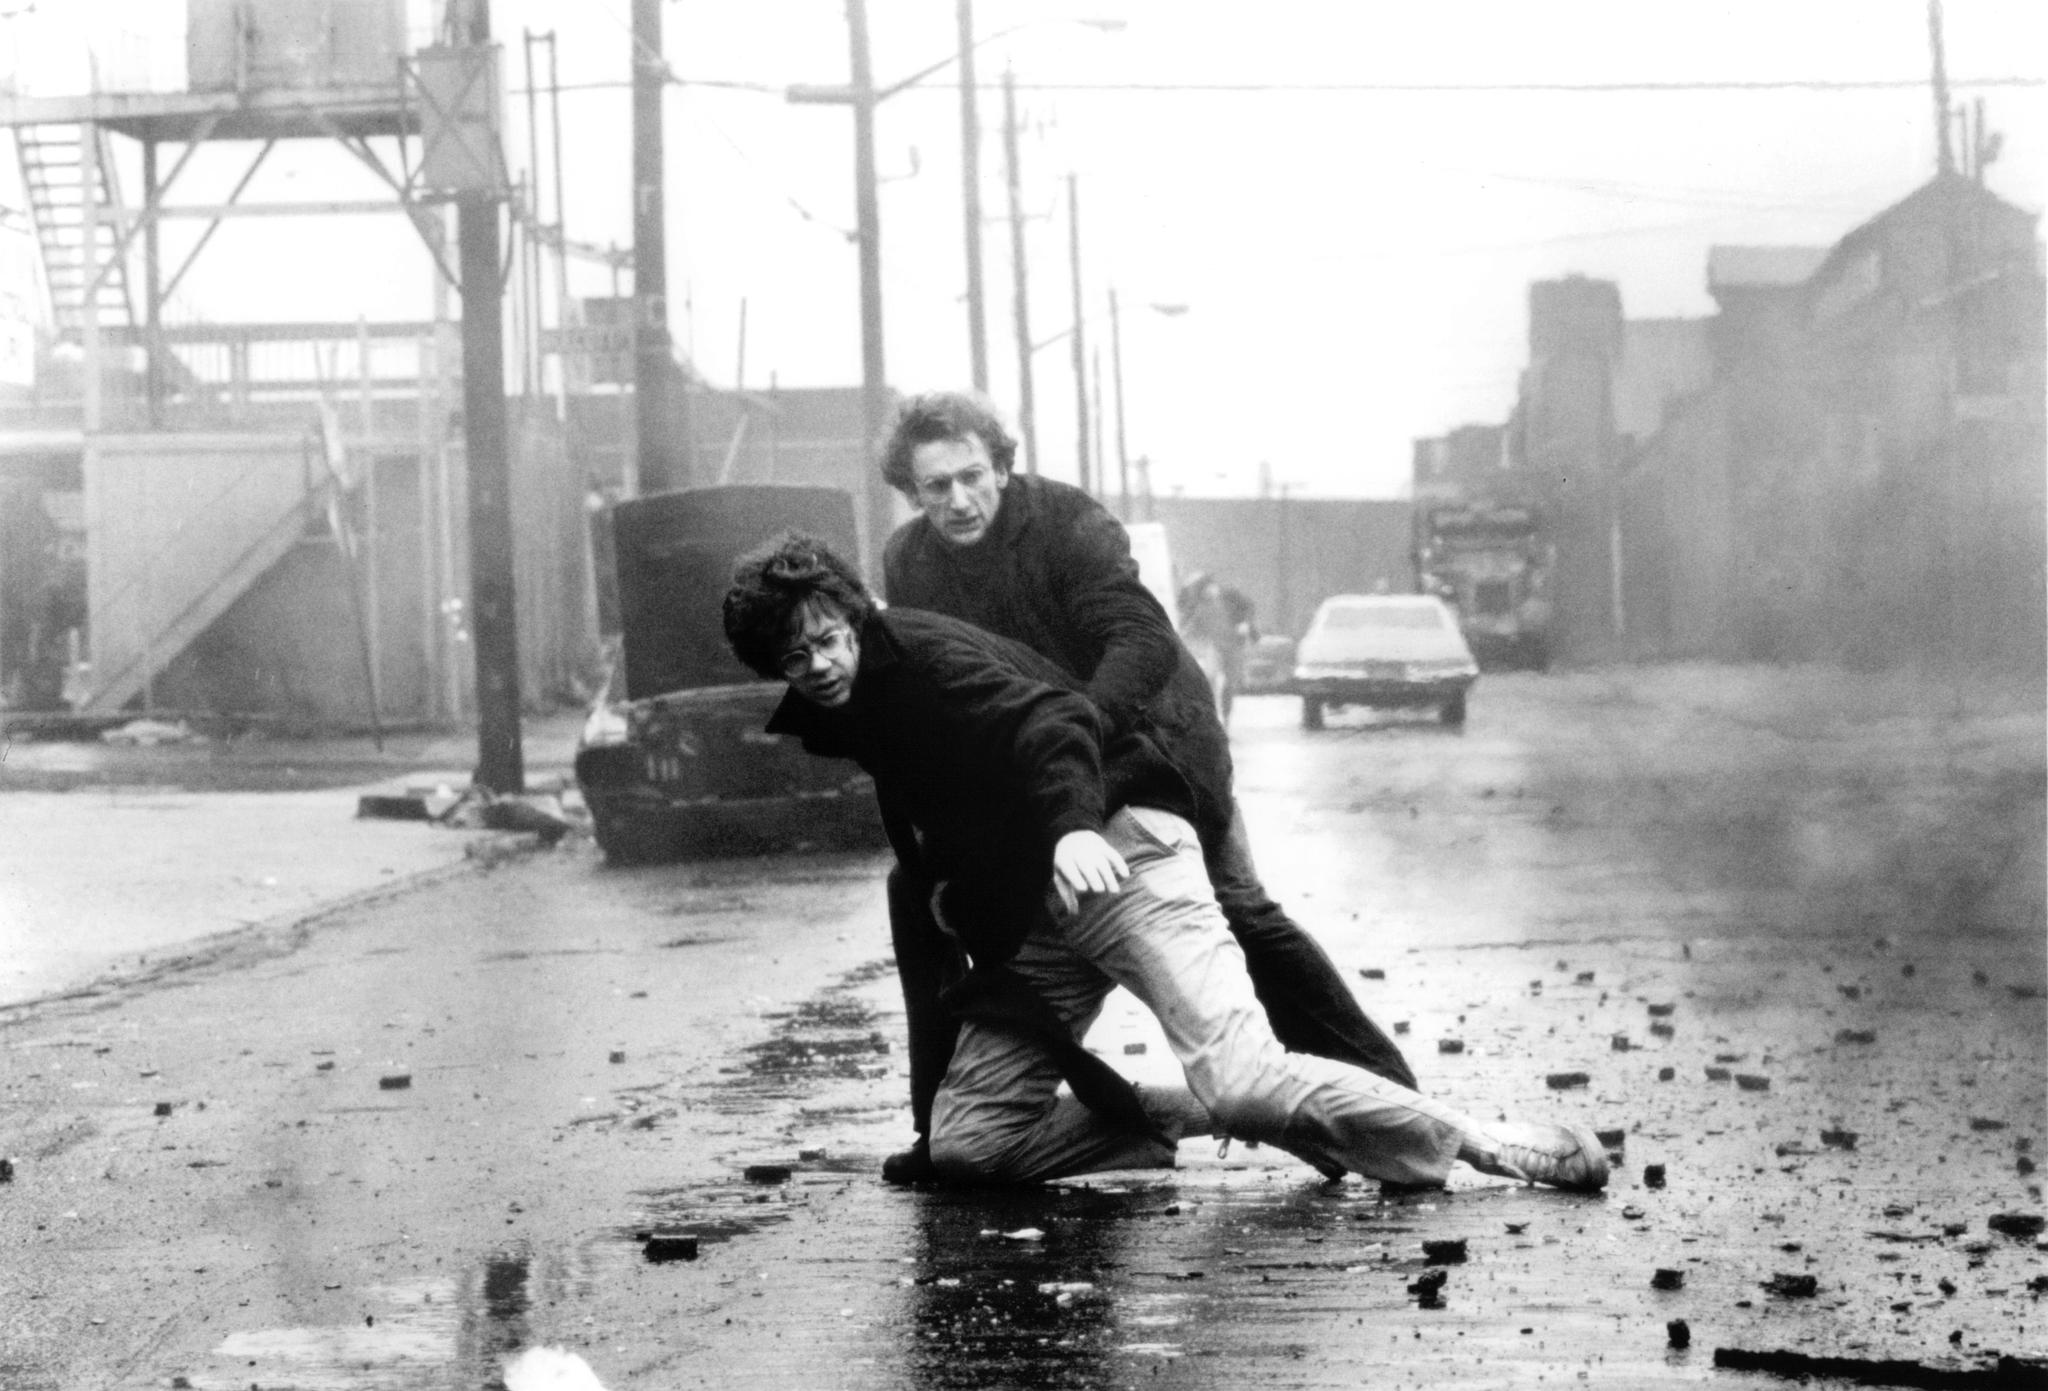 Tim Robbins and Matt Craven in Jacob's Ladder (1990)